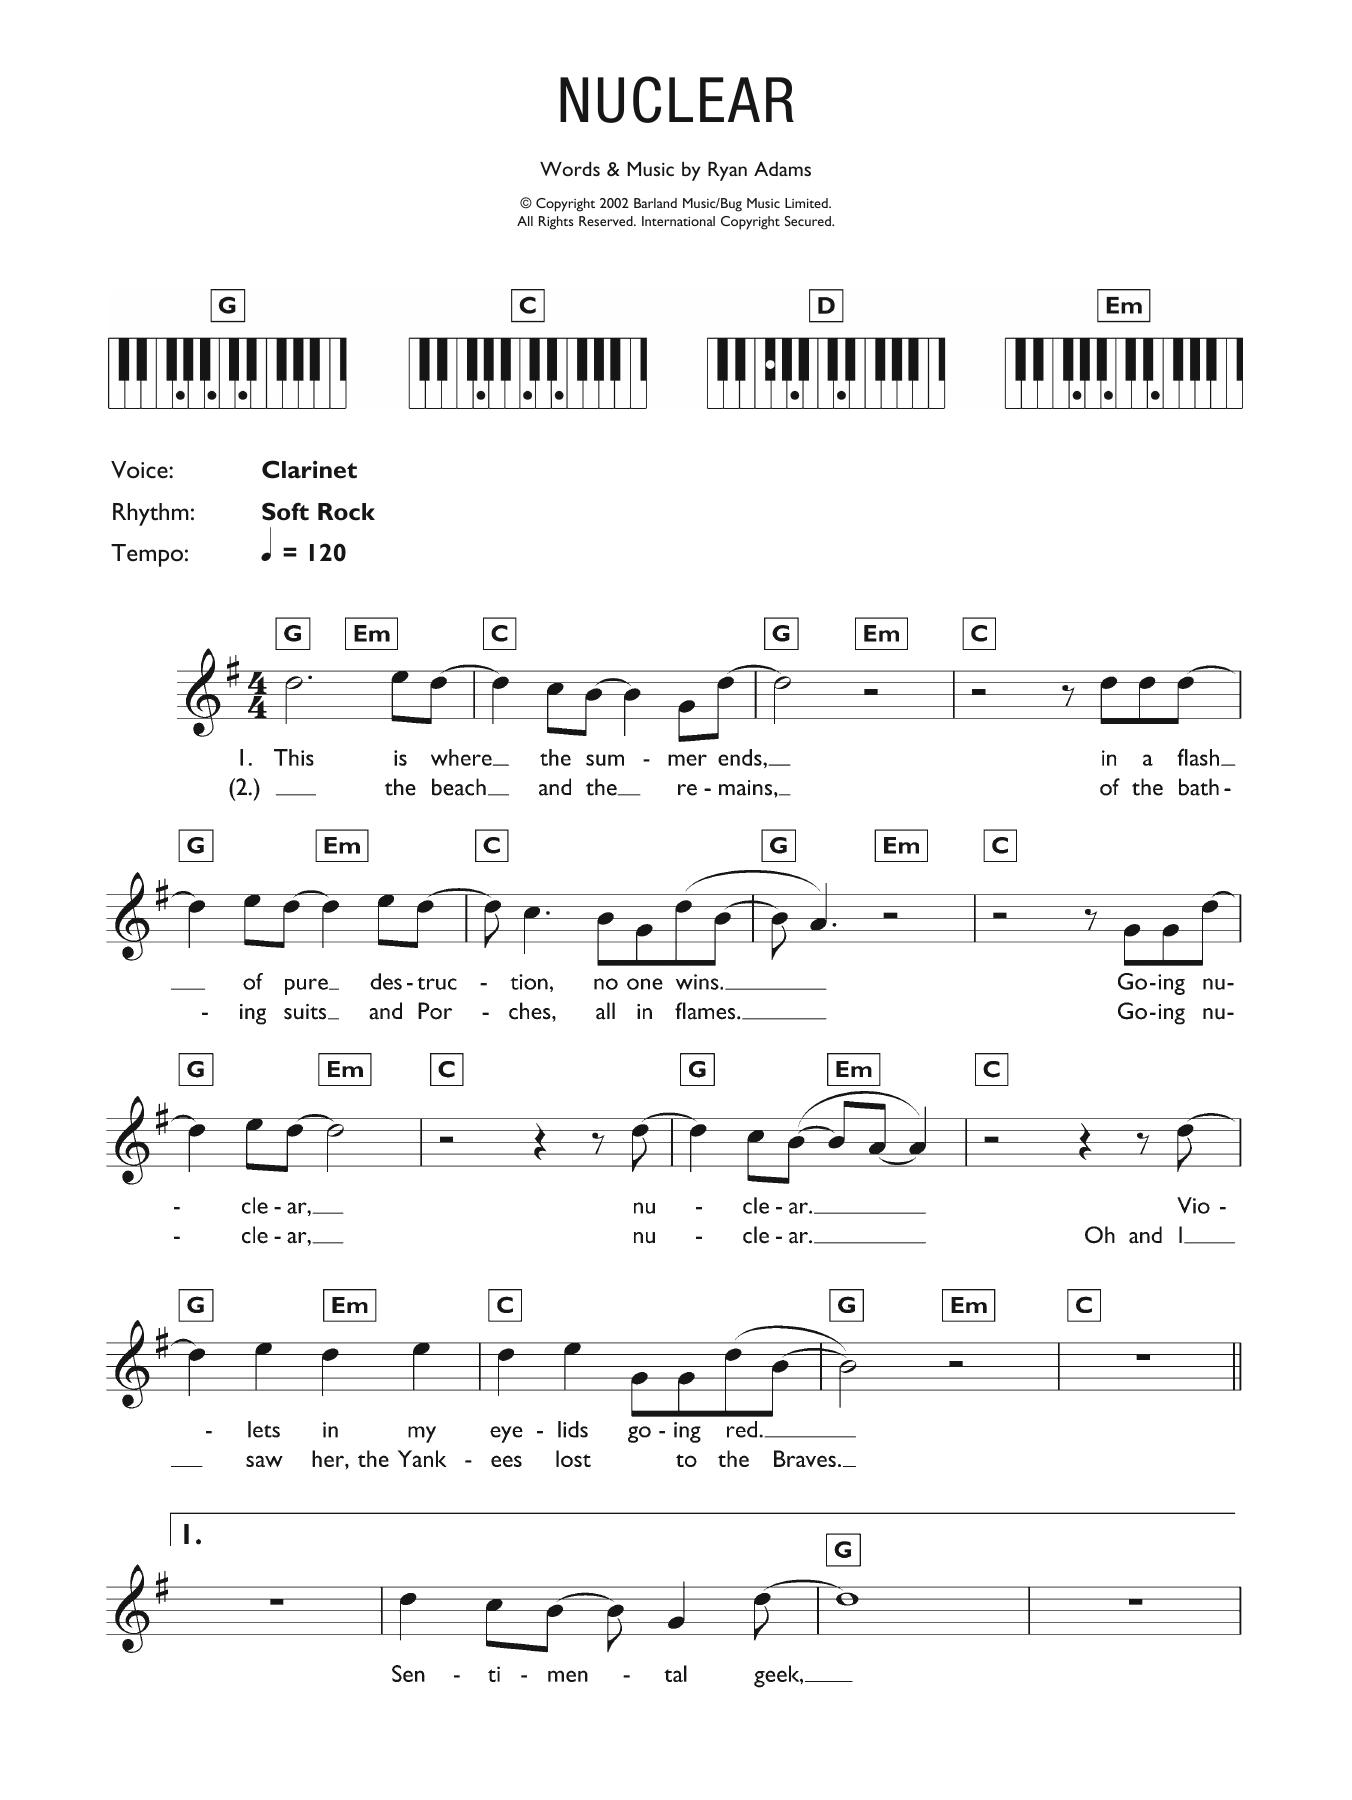 Nuclear Sheet Music